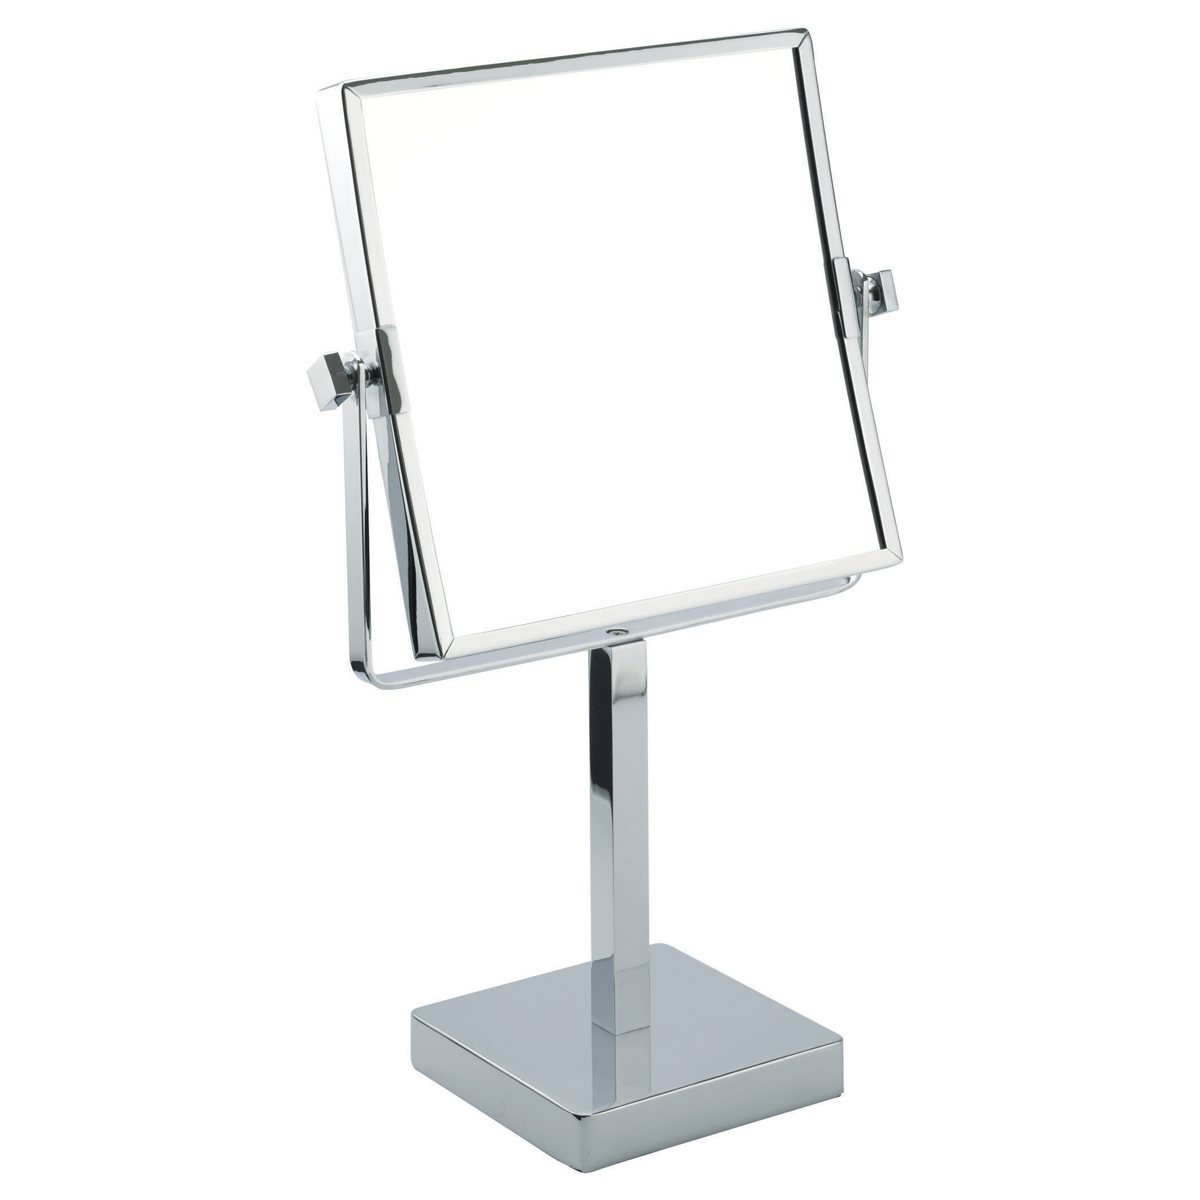 3x Magnification Chrome Pedestal Mirror - 197/20